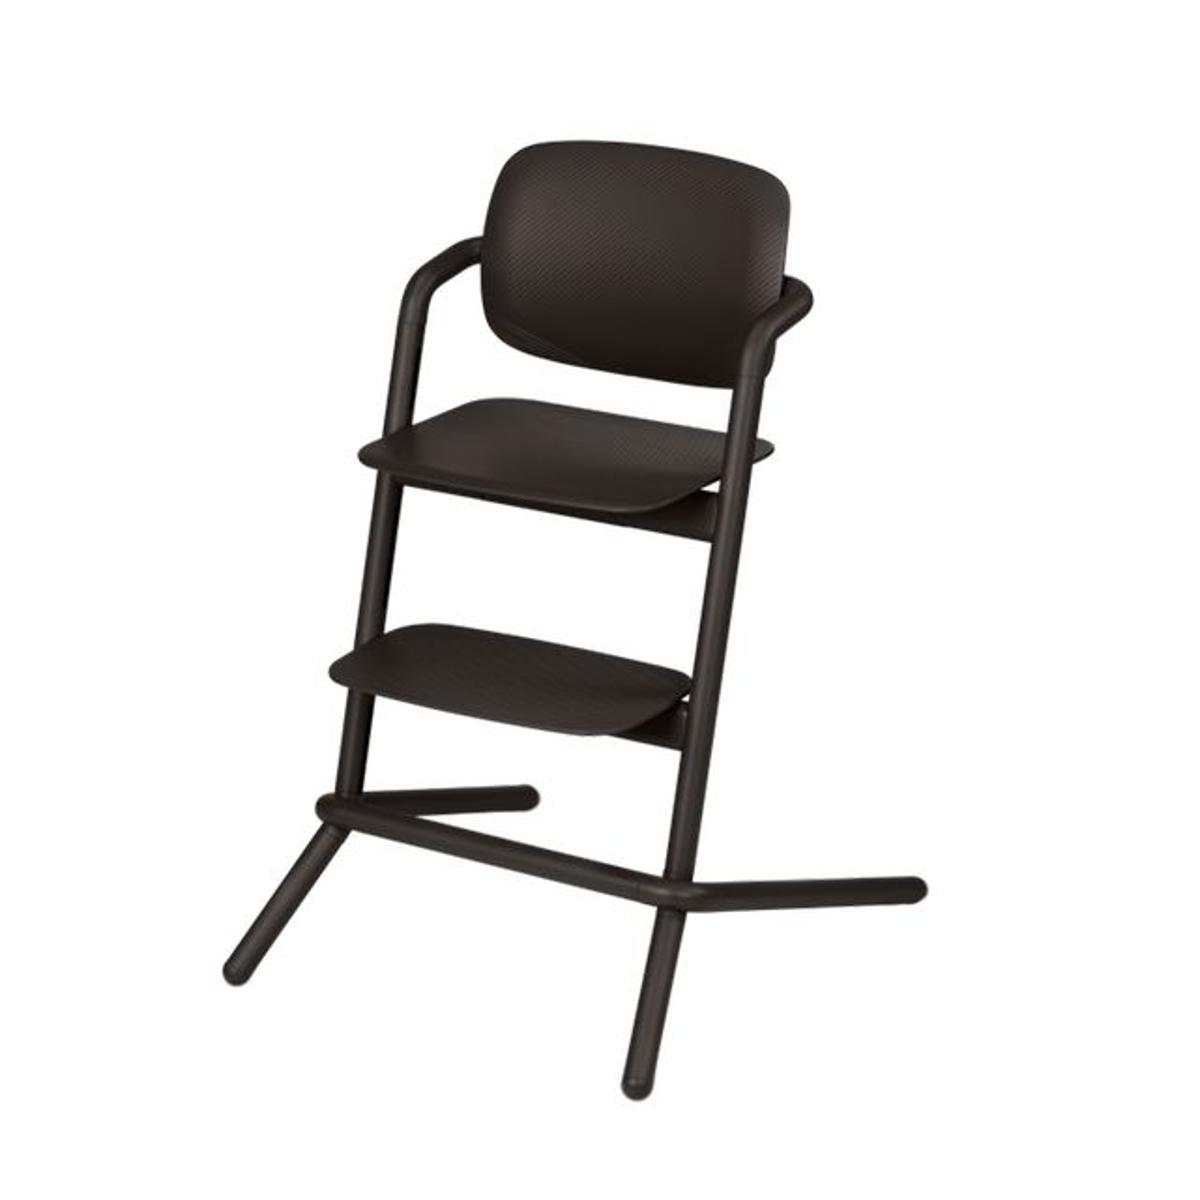 Chaise haute Lemo infinity black